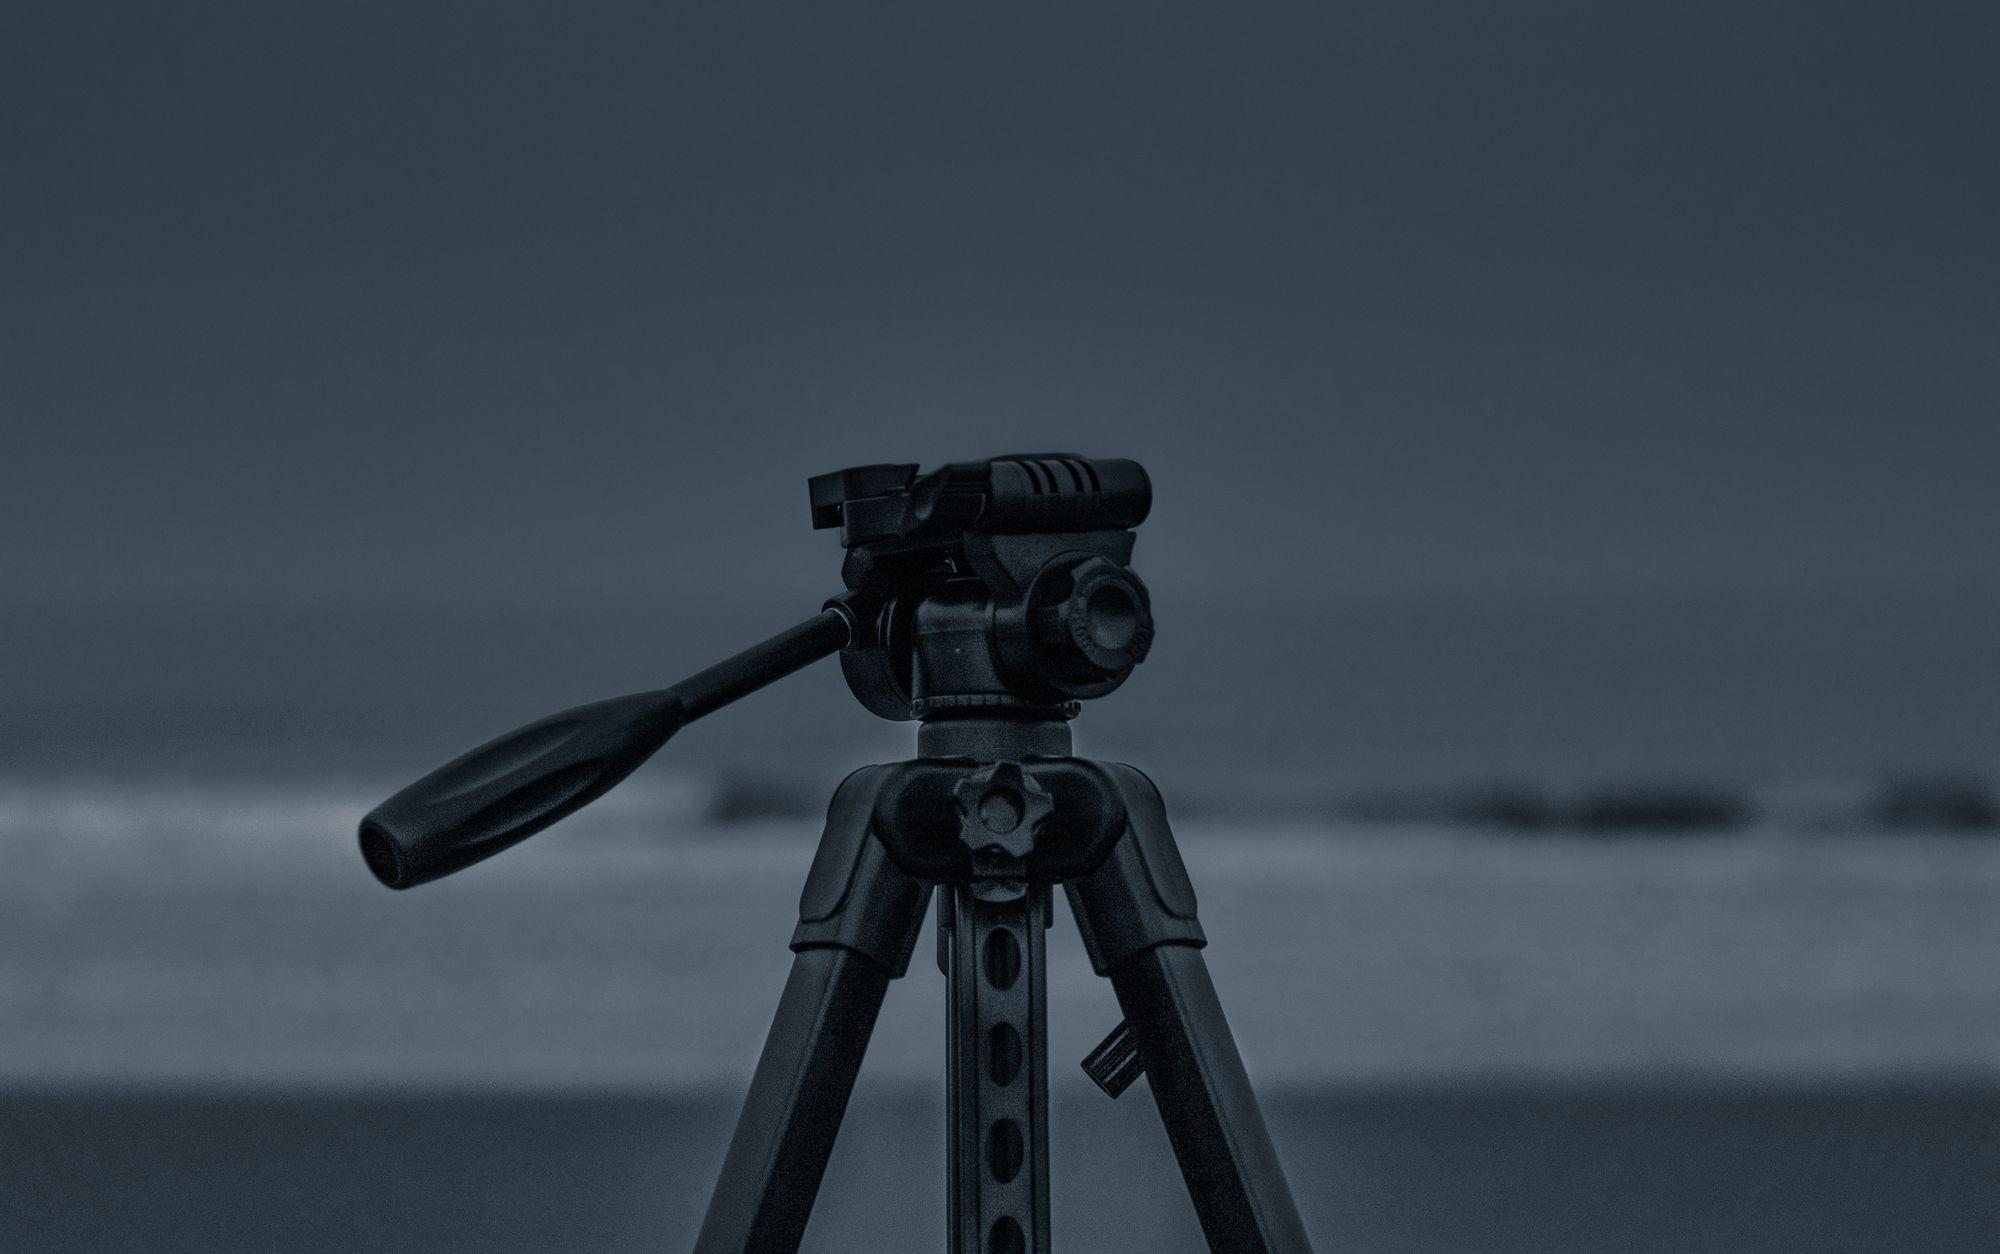 A tripod is an essential camera gear